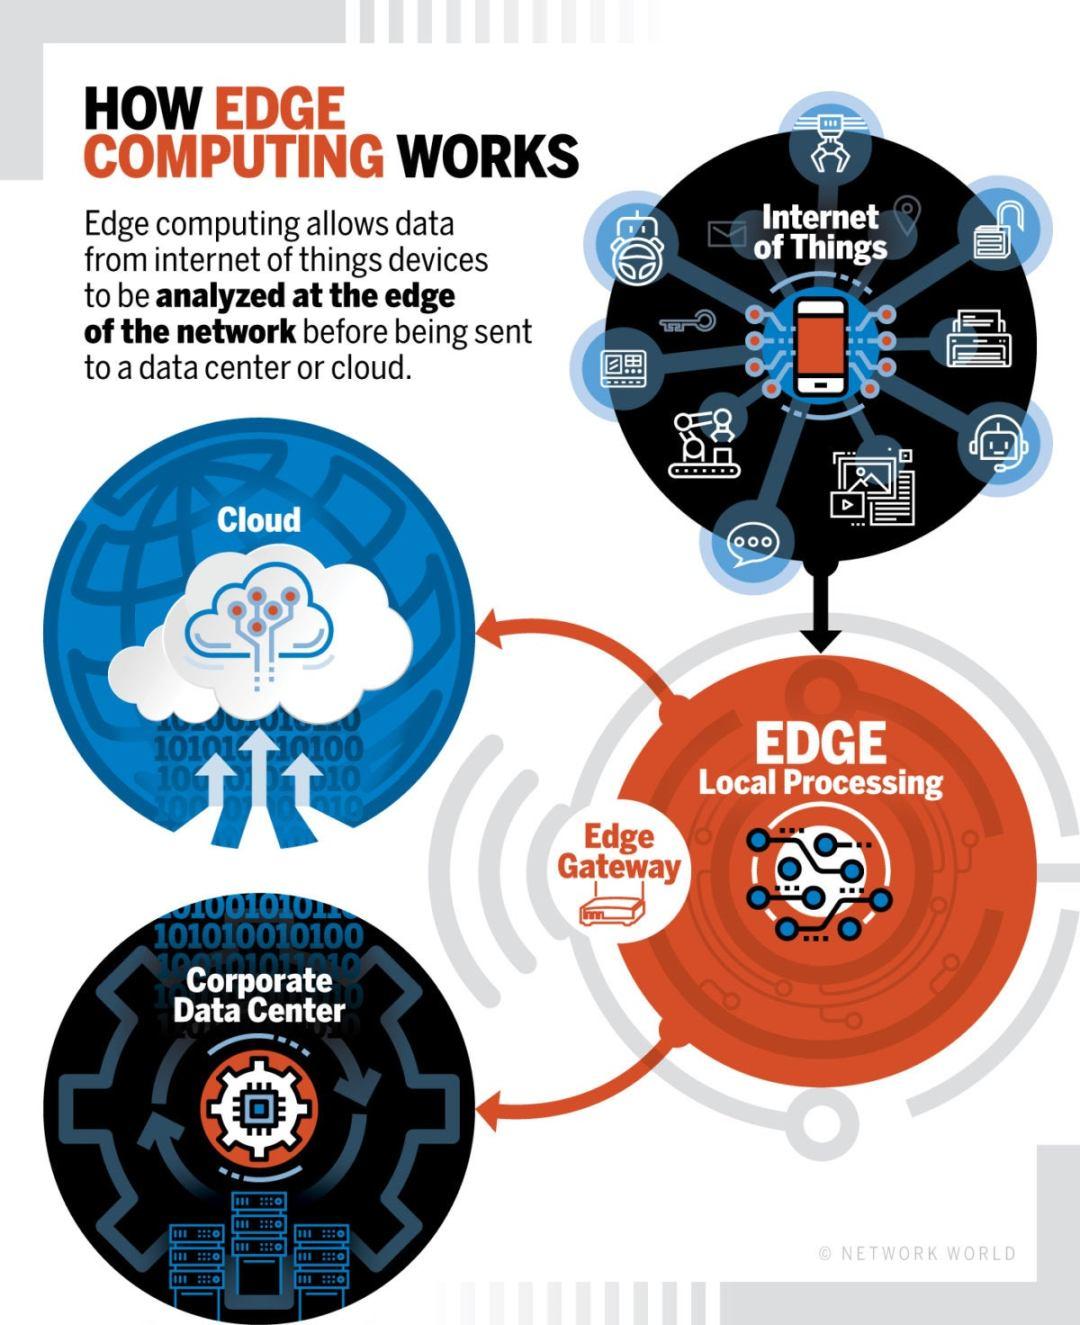 Network World - How Edge Computing Works [diagram]